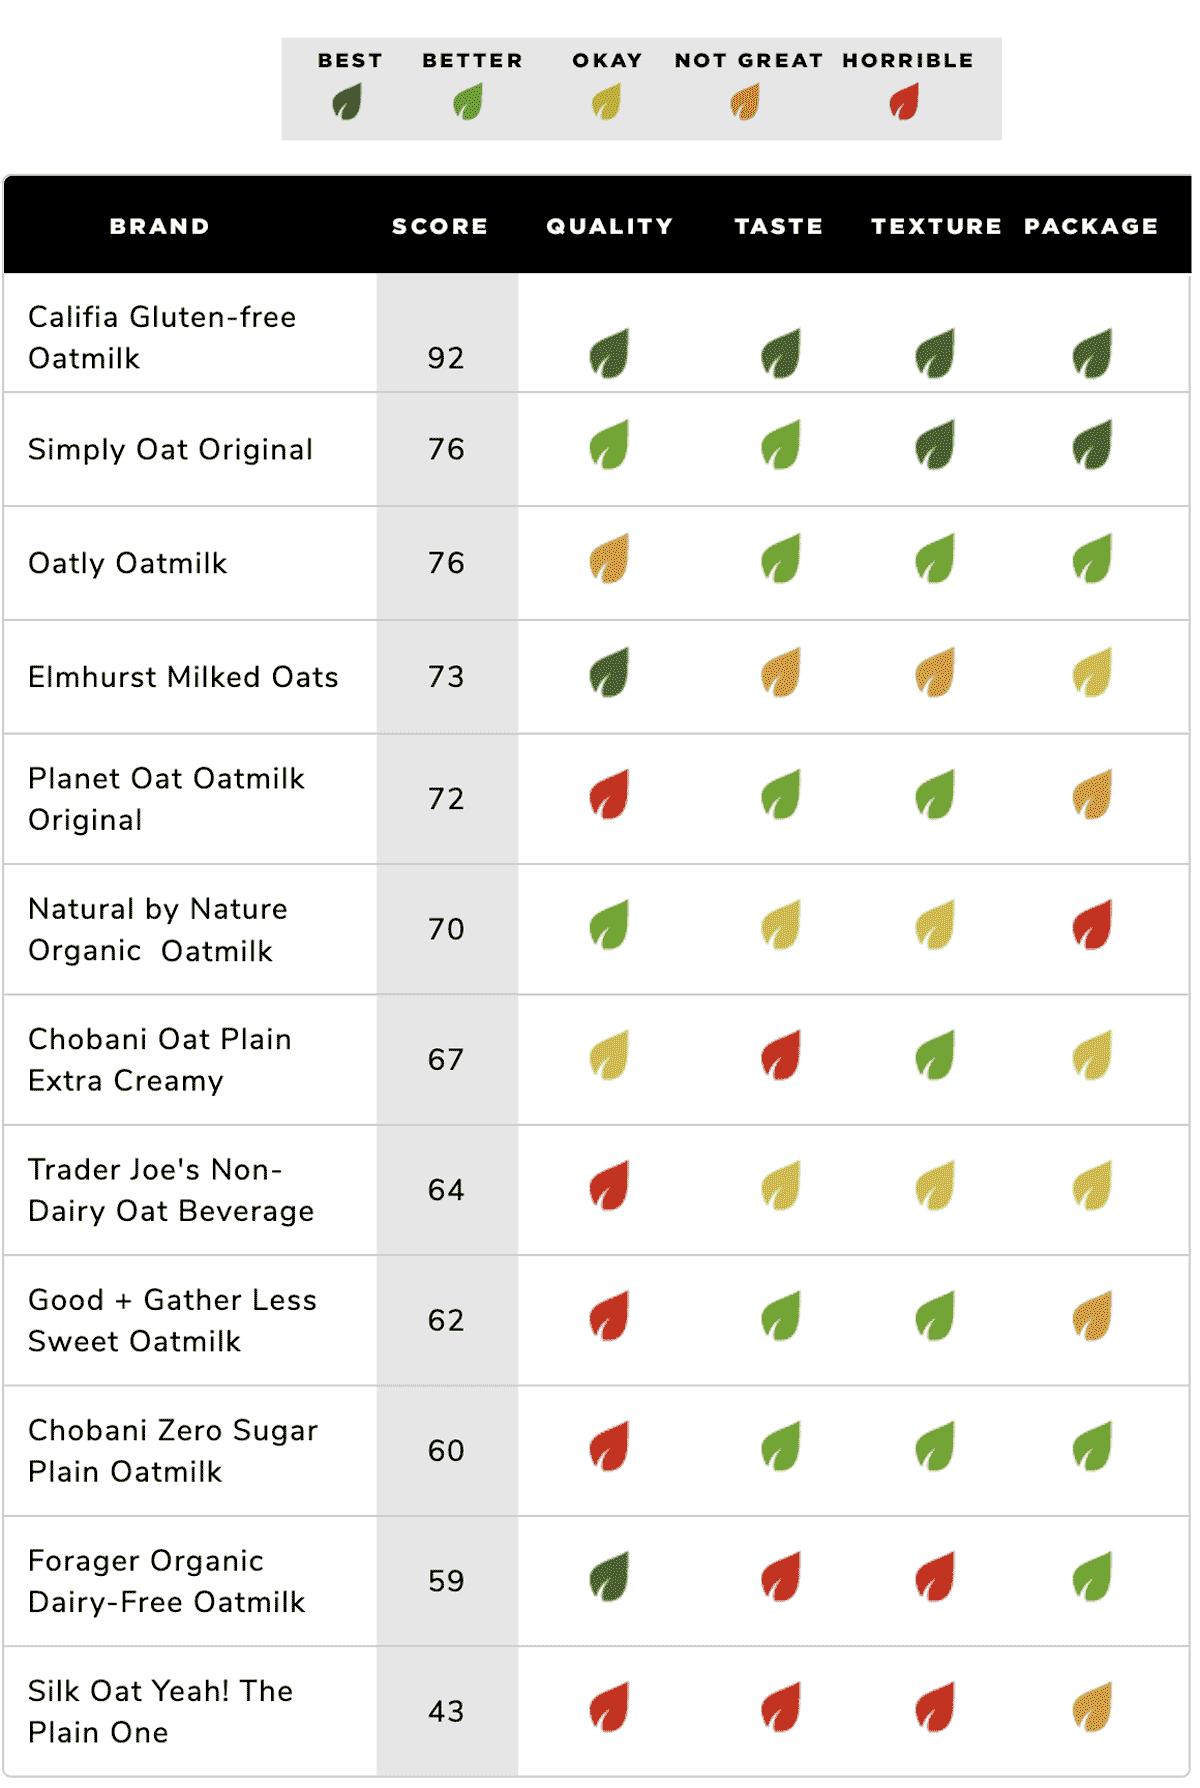 chart highlighting the best oatmilk brands